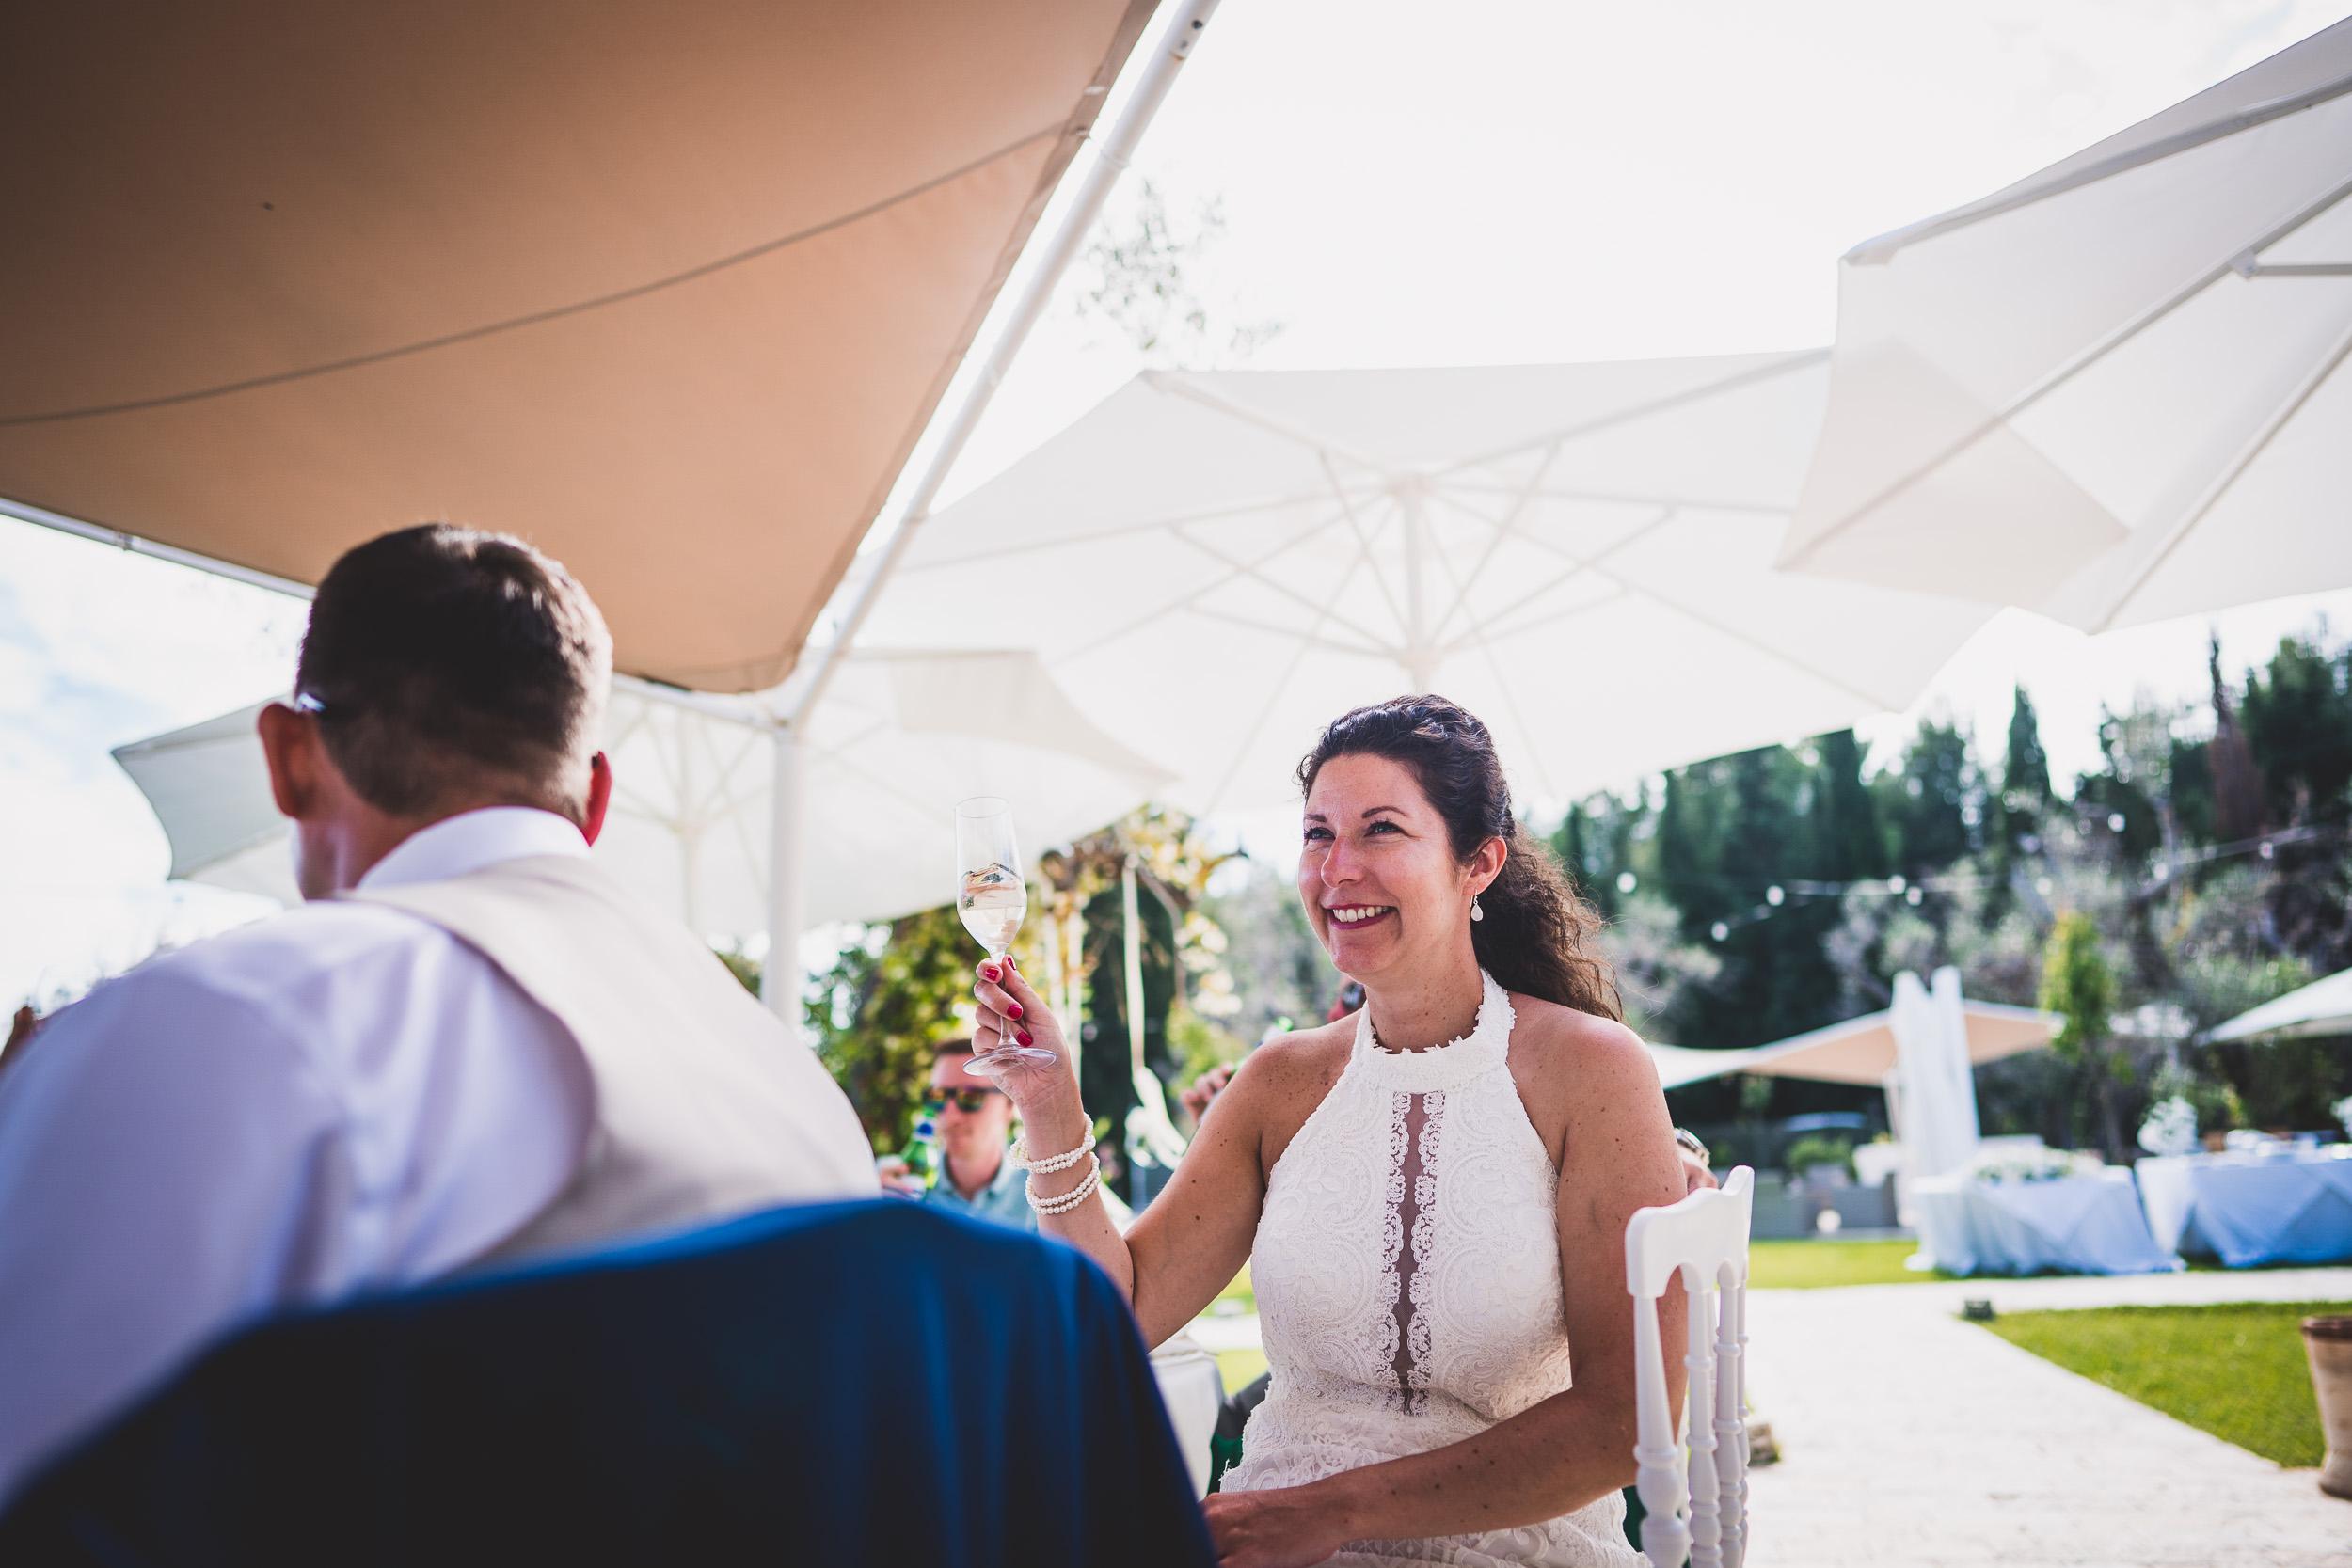 Destination wedding photography | Anna & Nigel destination wedding photography 049